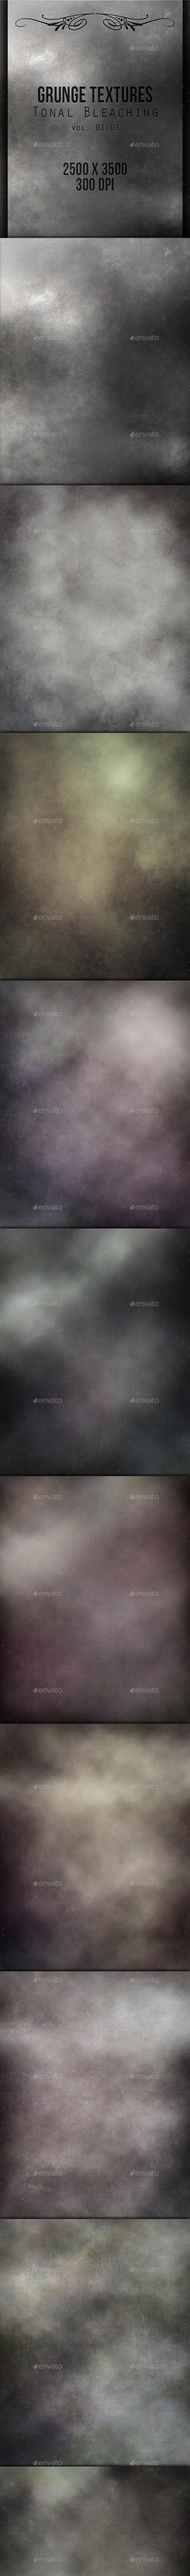 Grunge Textures - Tonal Bleaching 01 - Industrial / Grunge Textures